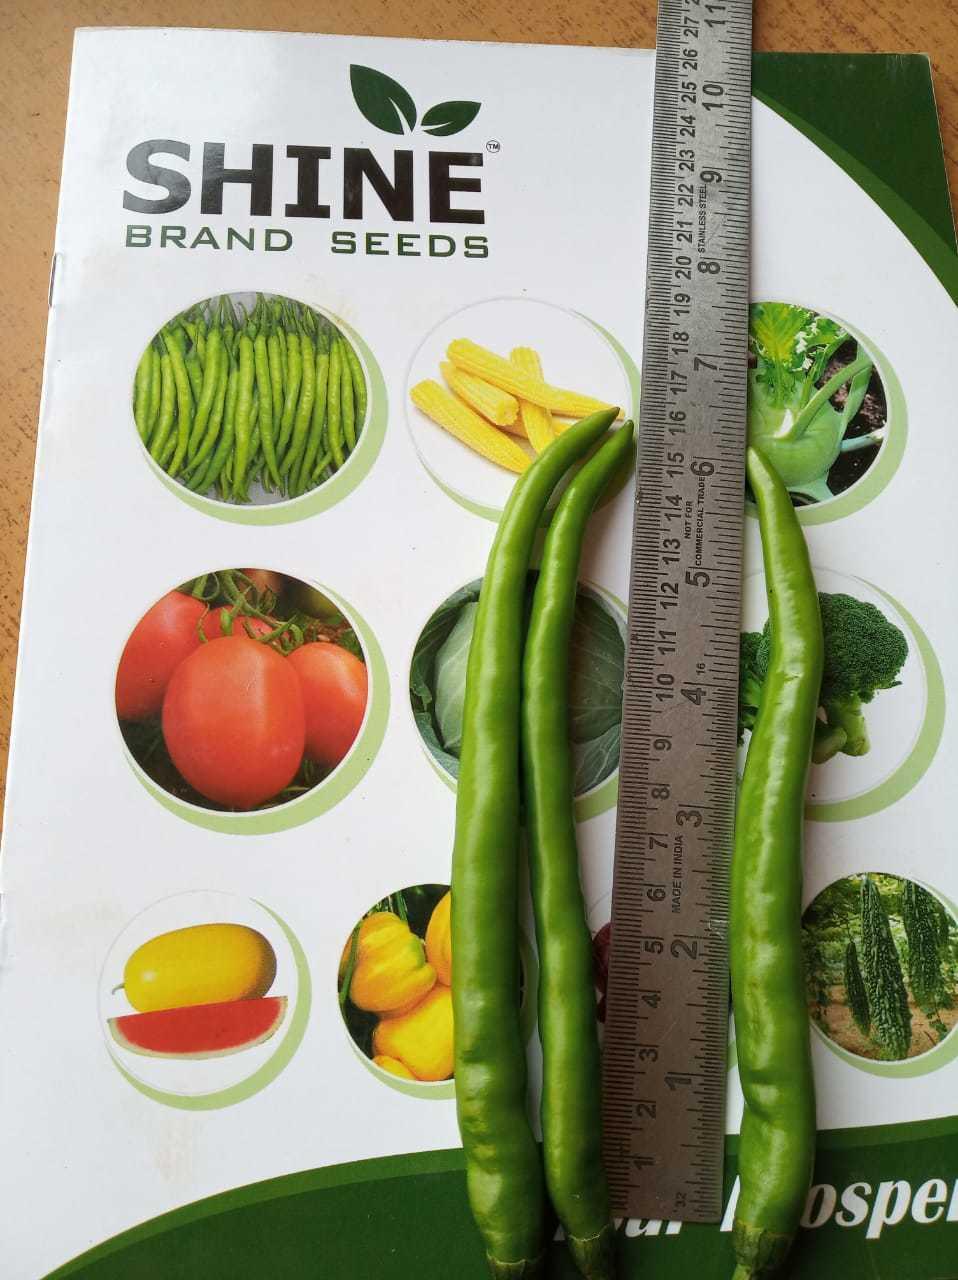 F1-Shine 610 Hybrid Chilli Seed